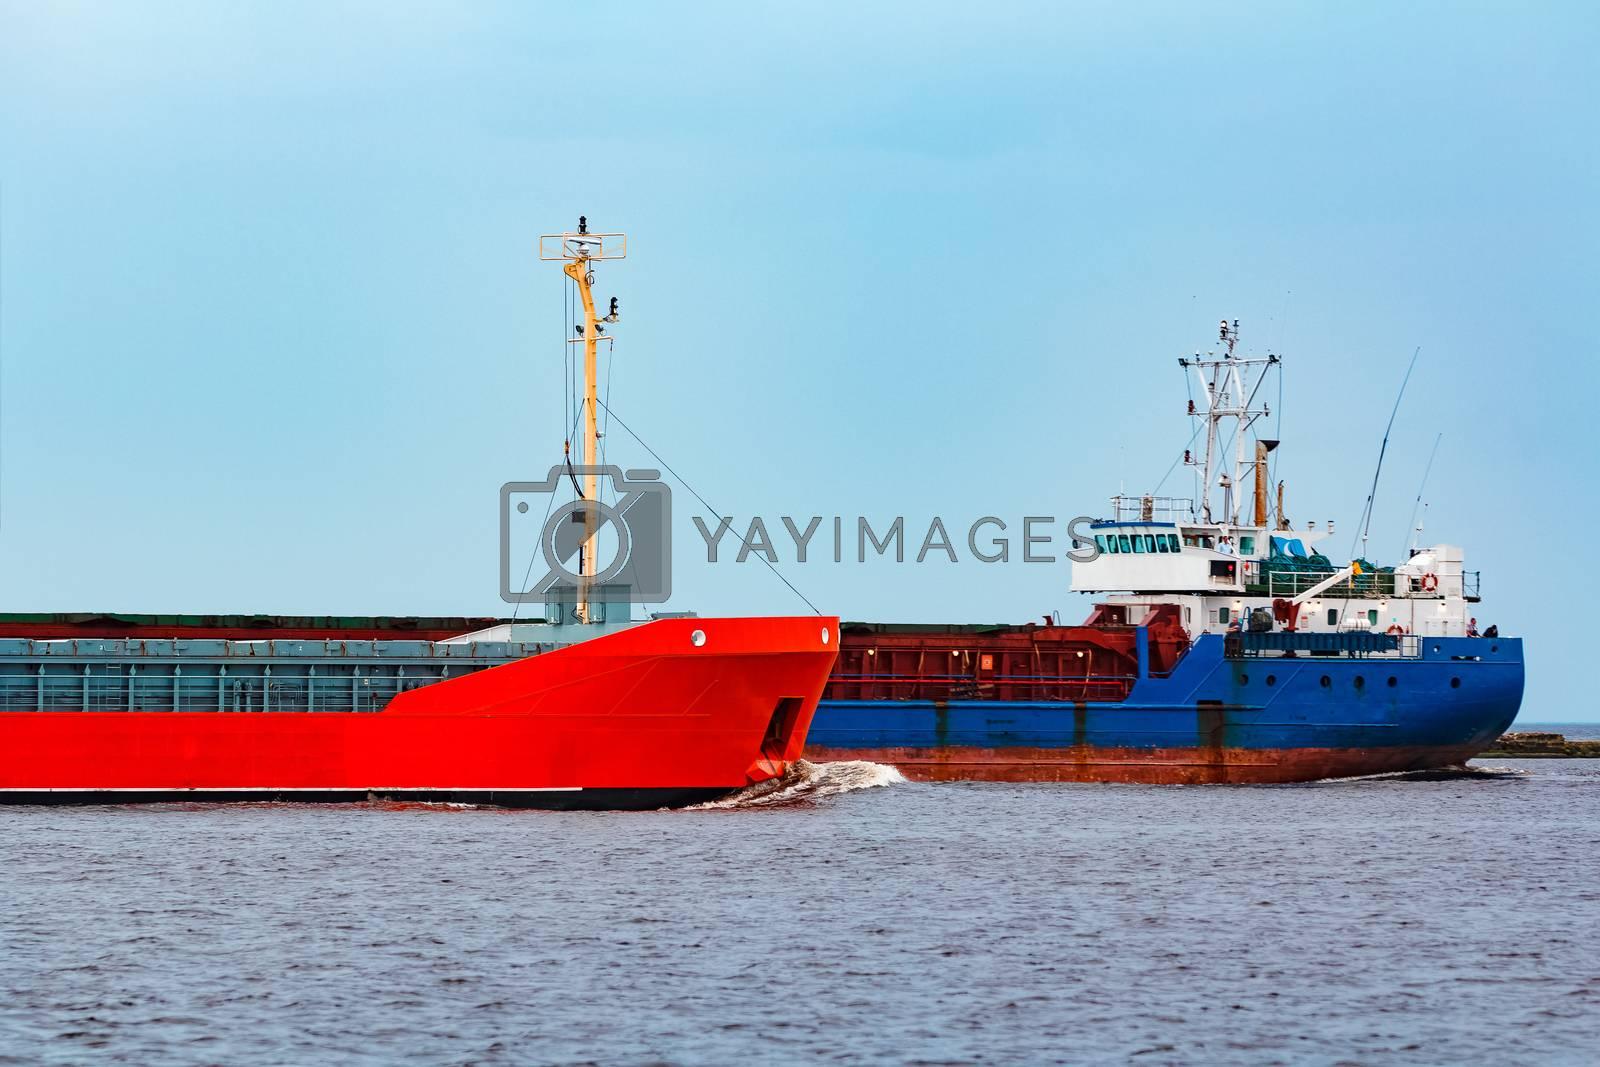 Orange cargo ship sailing past the blue bulk carrier